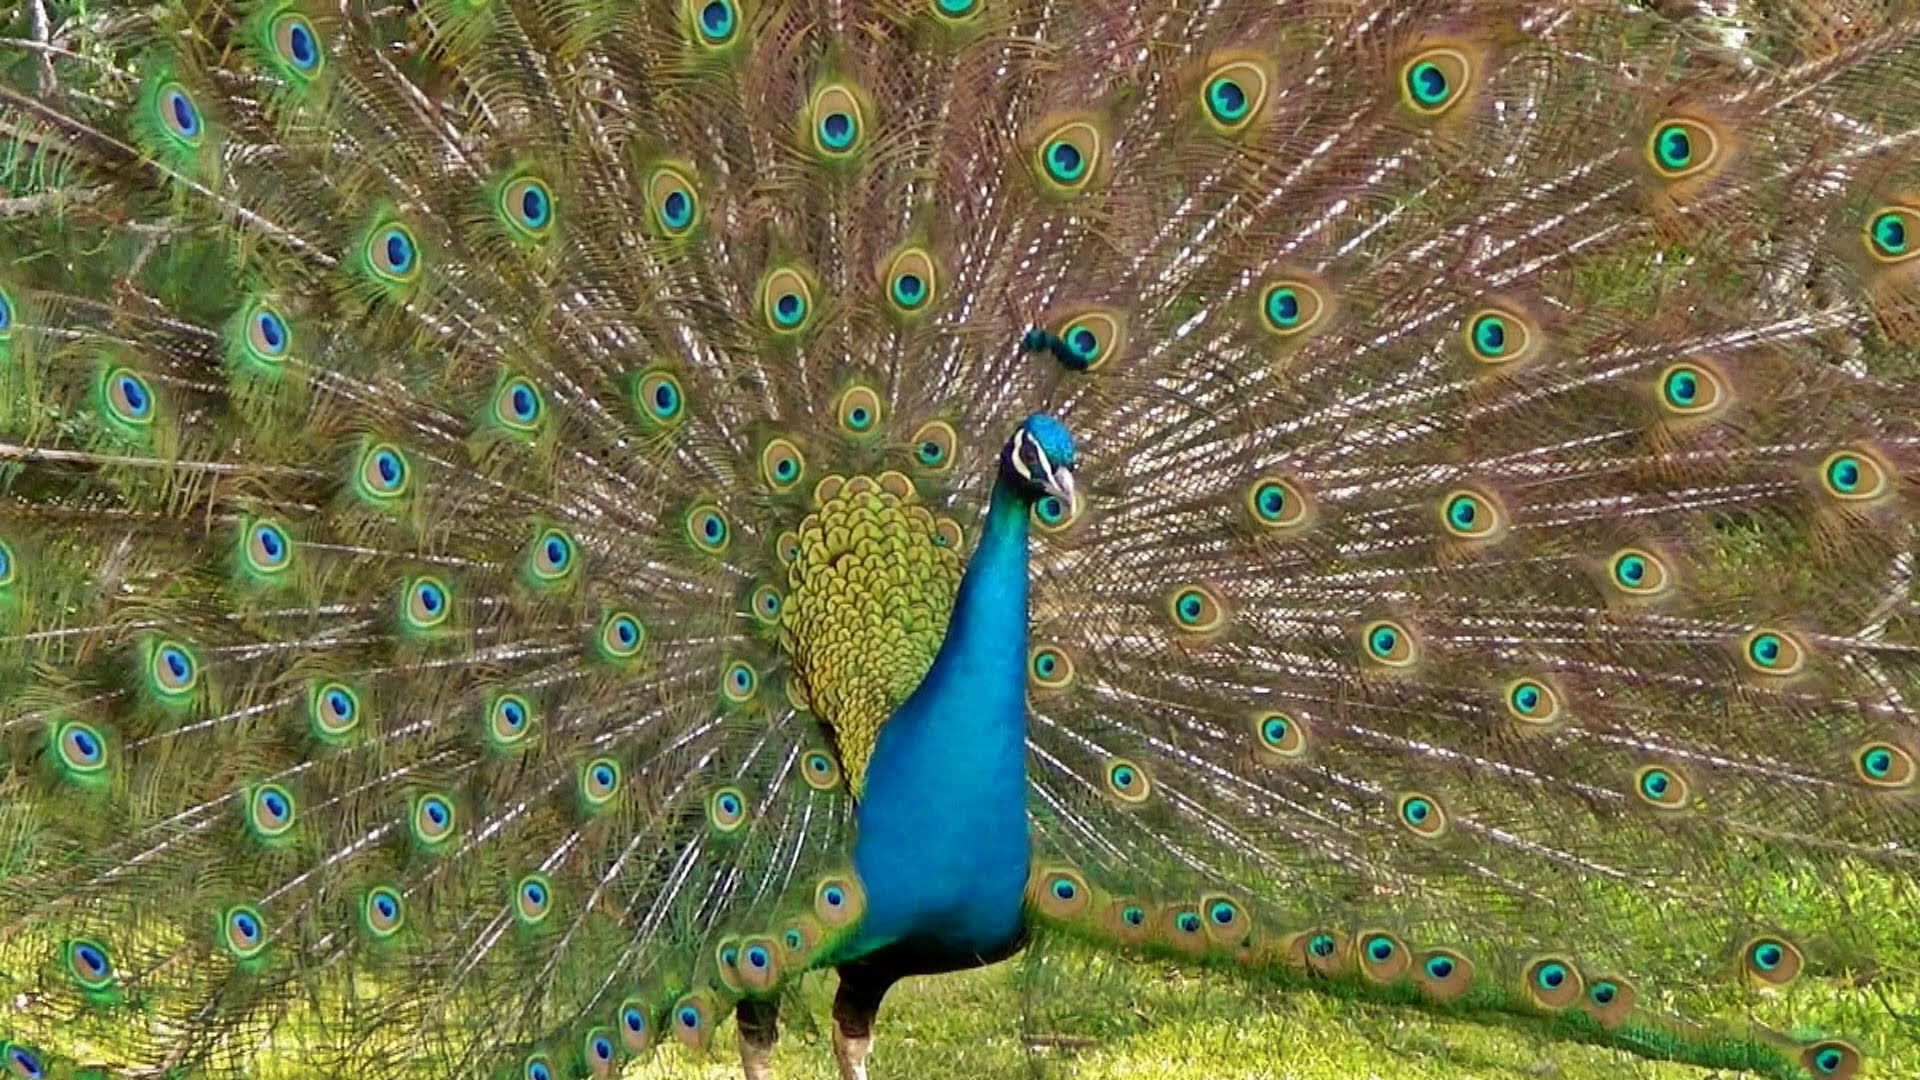 Peacock Dance Display - Peacocks Opening Feathers HD & Bird Sound ...